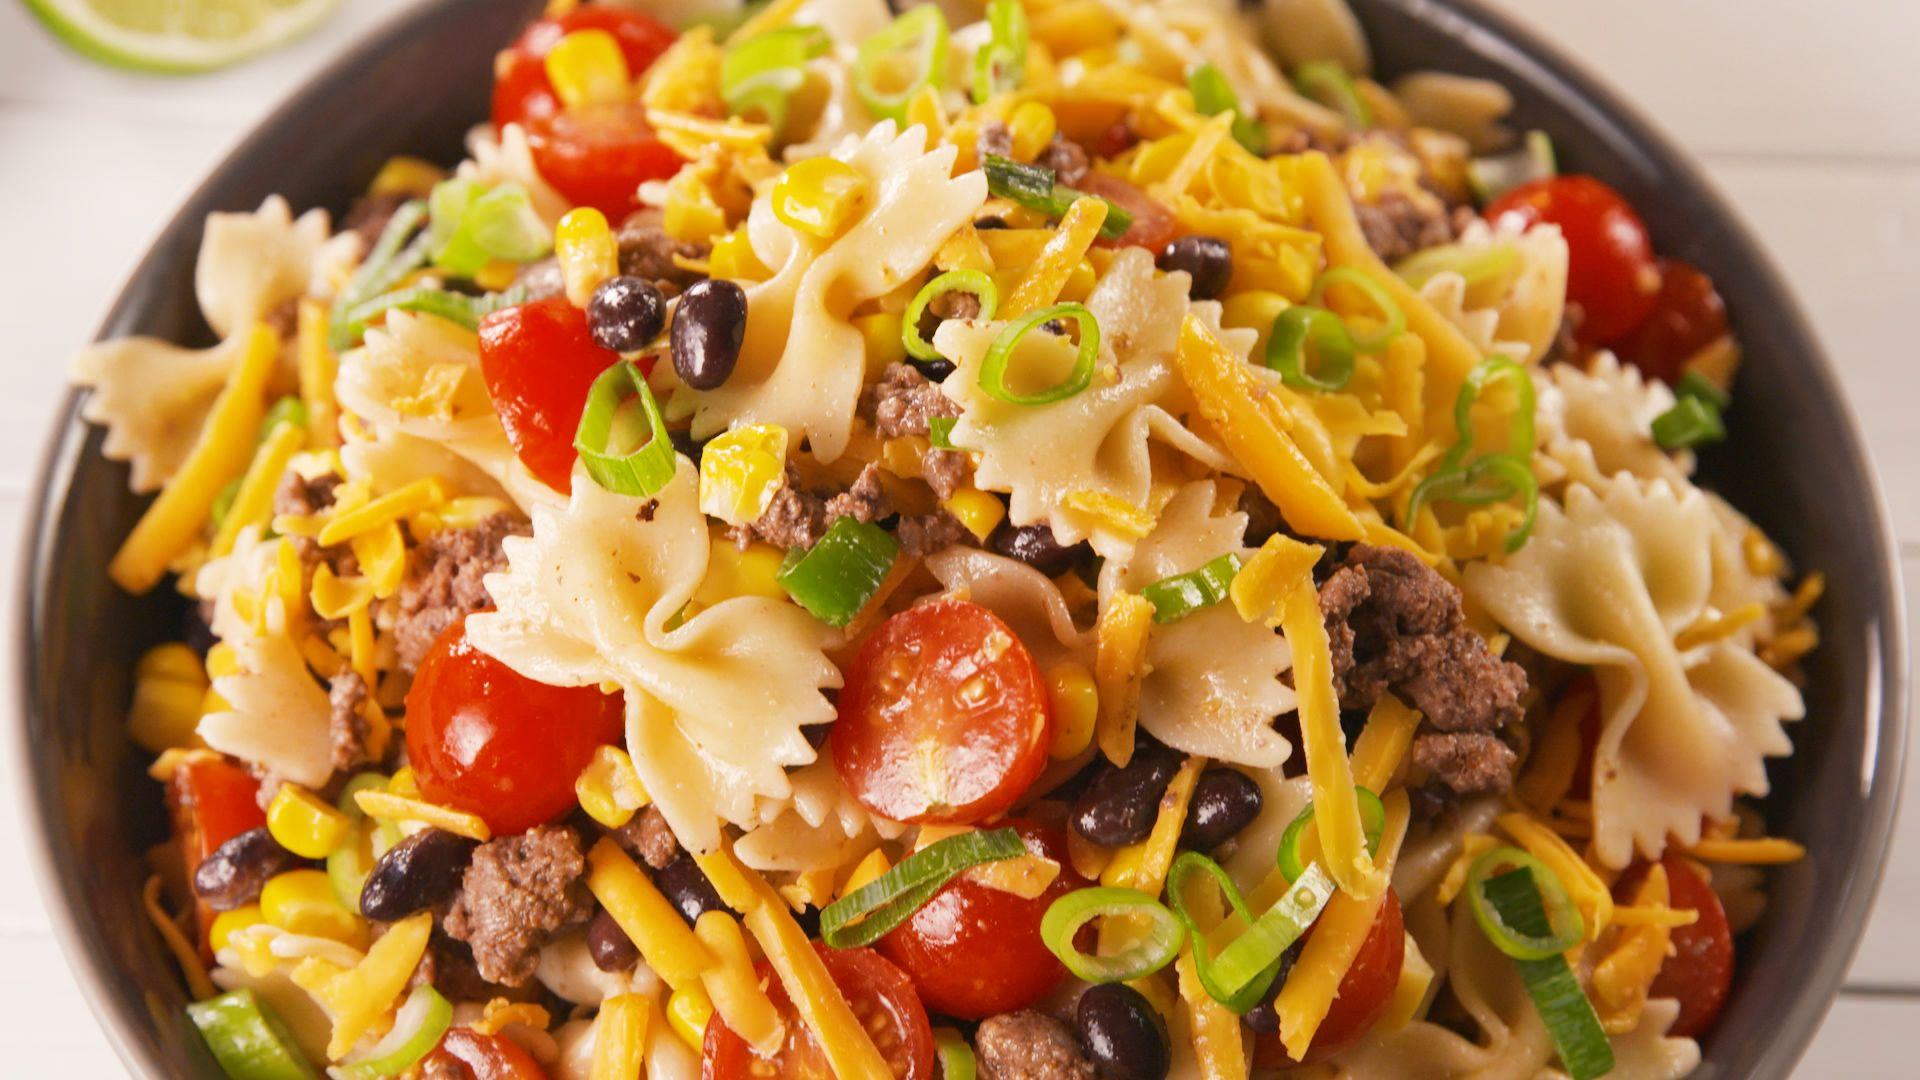 best cowboy pasta salad recipe how to make cowboy pasta salad